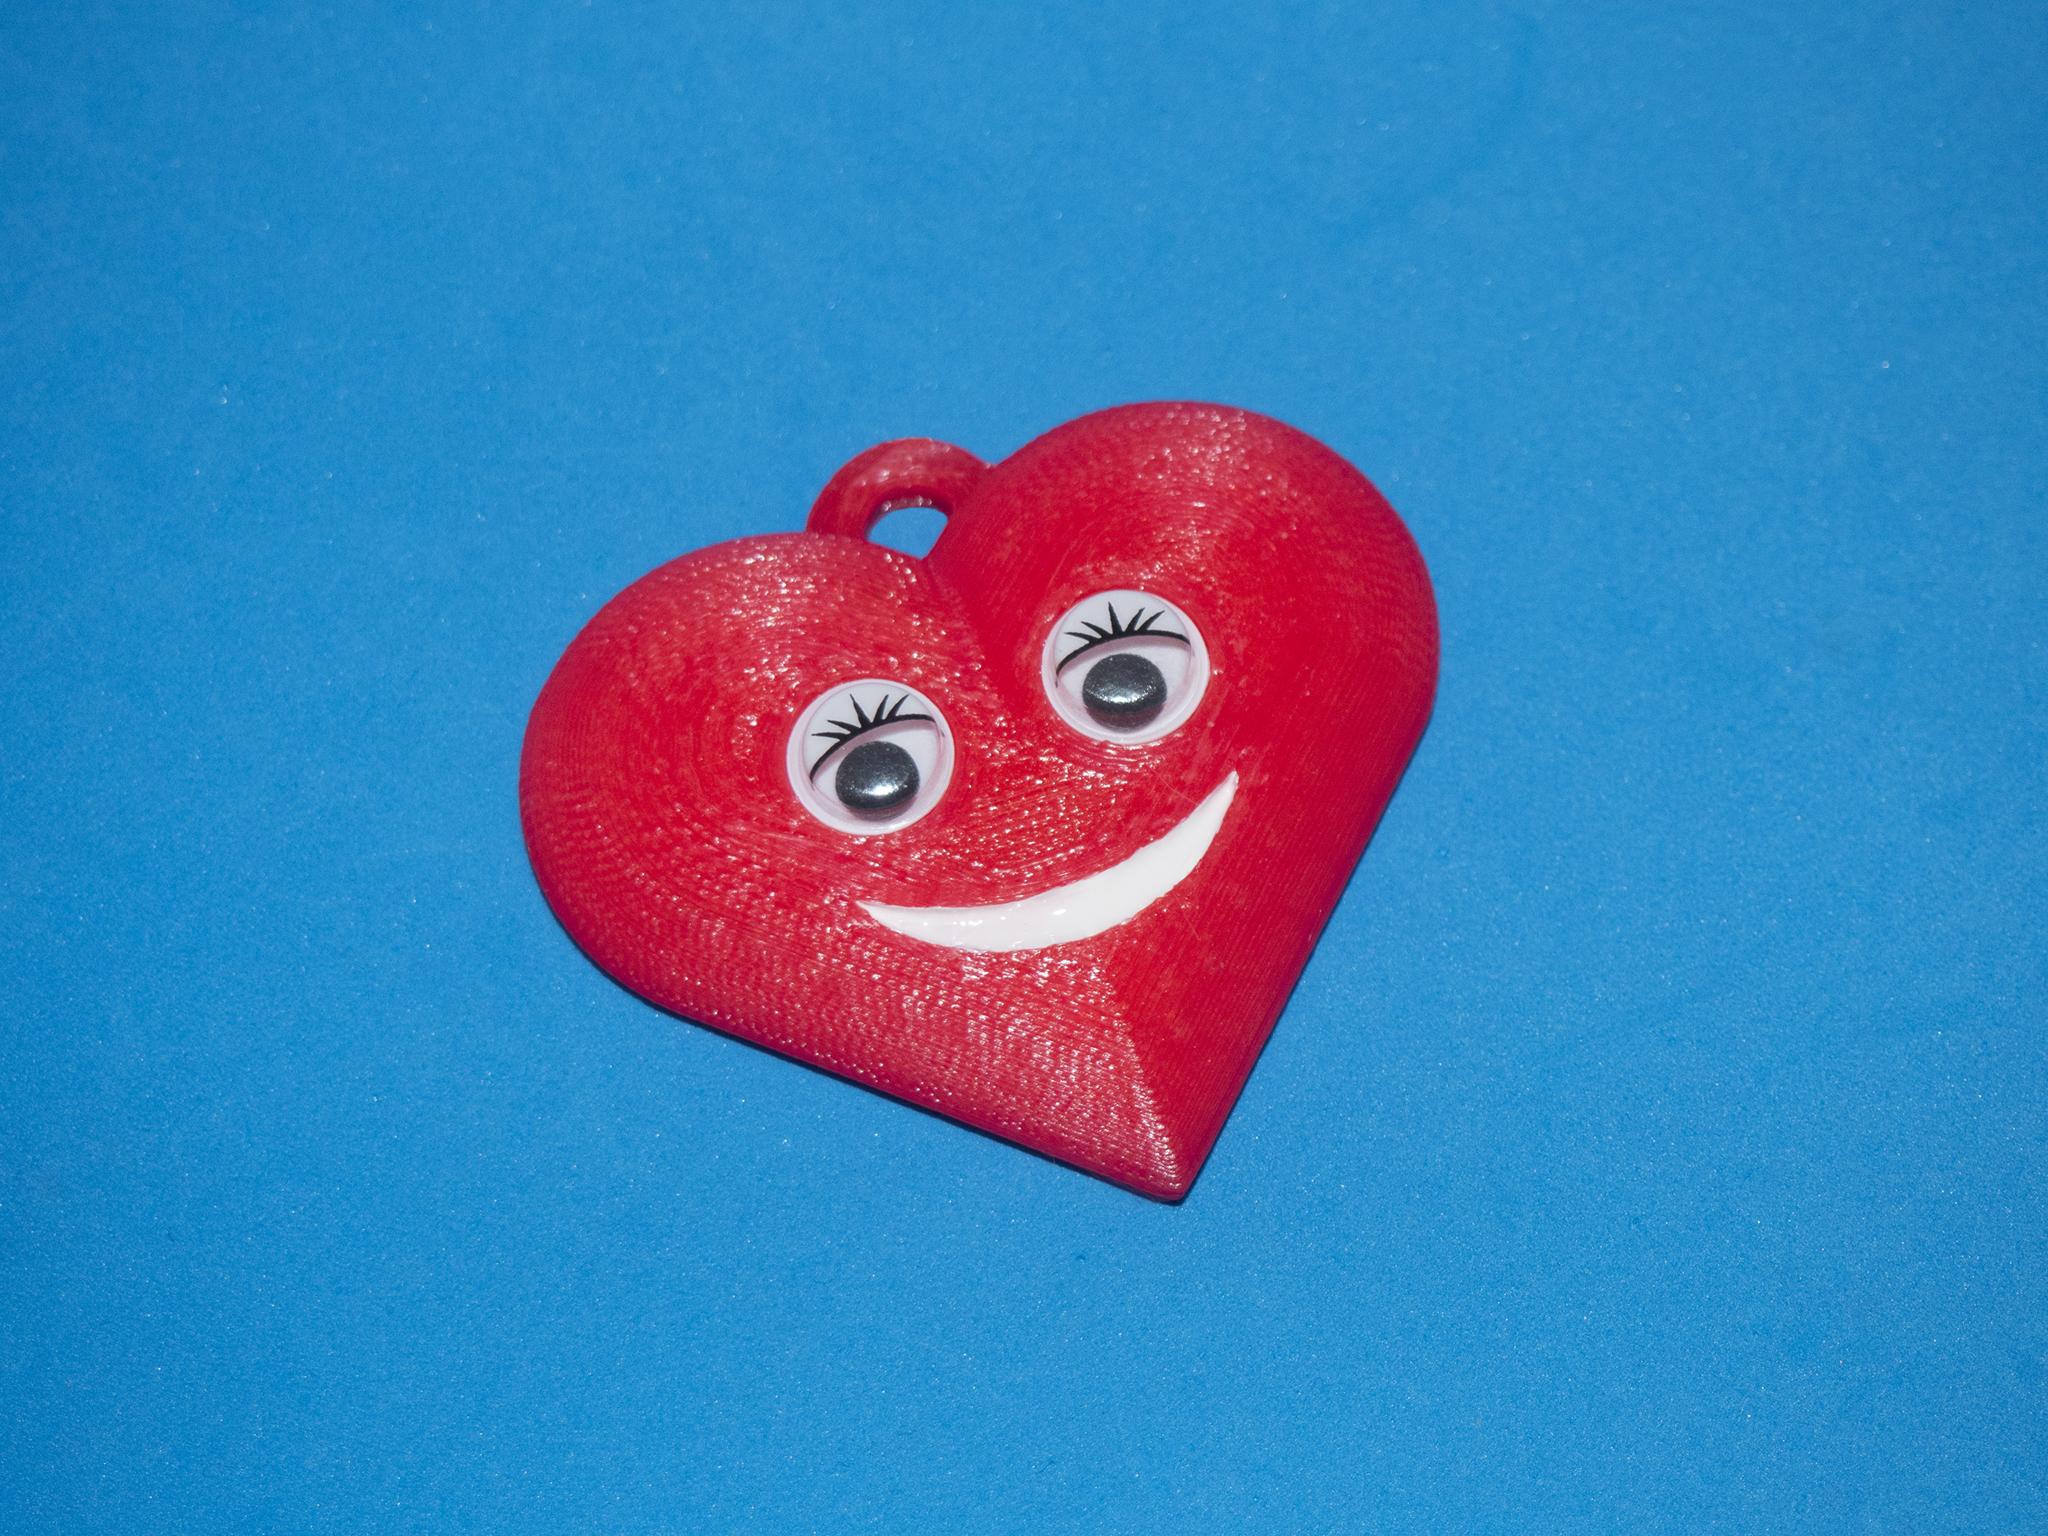 P1010002.jpg Download free STL file Smiling Heart Key chain • 3D printer template, dancingchicken